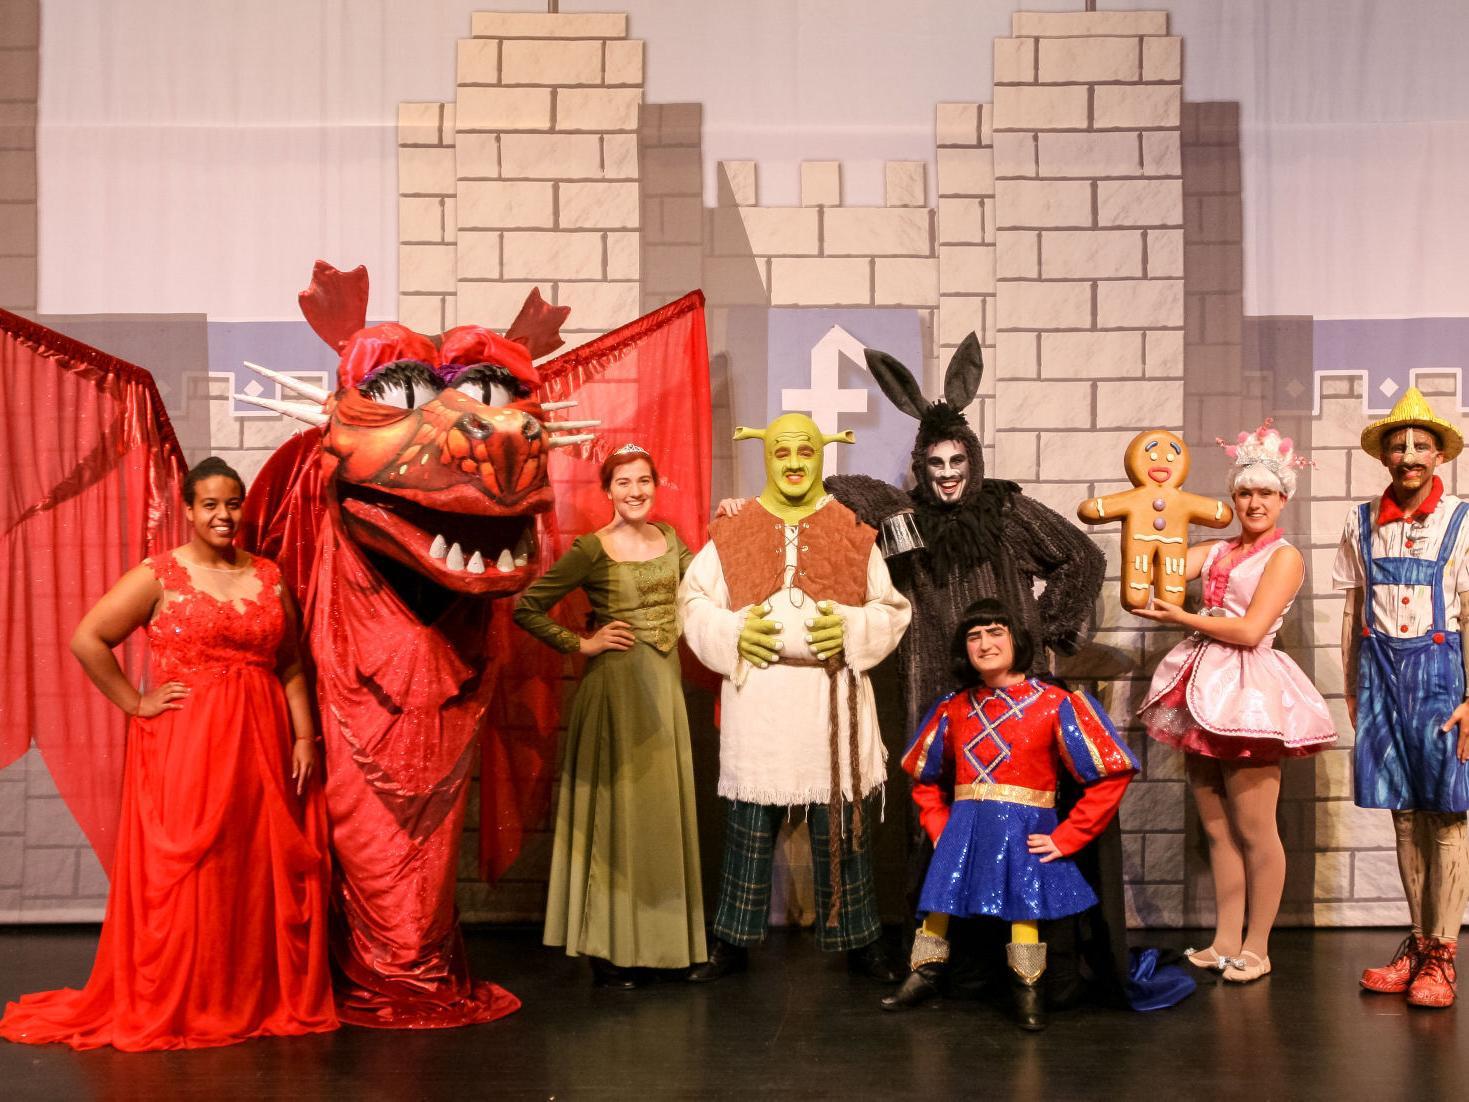 On Stage Shrek The Musical Local Entertainment Globegazette Com